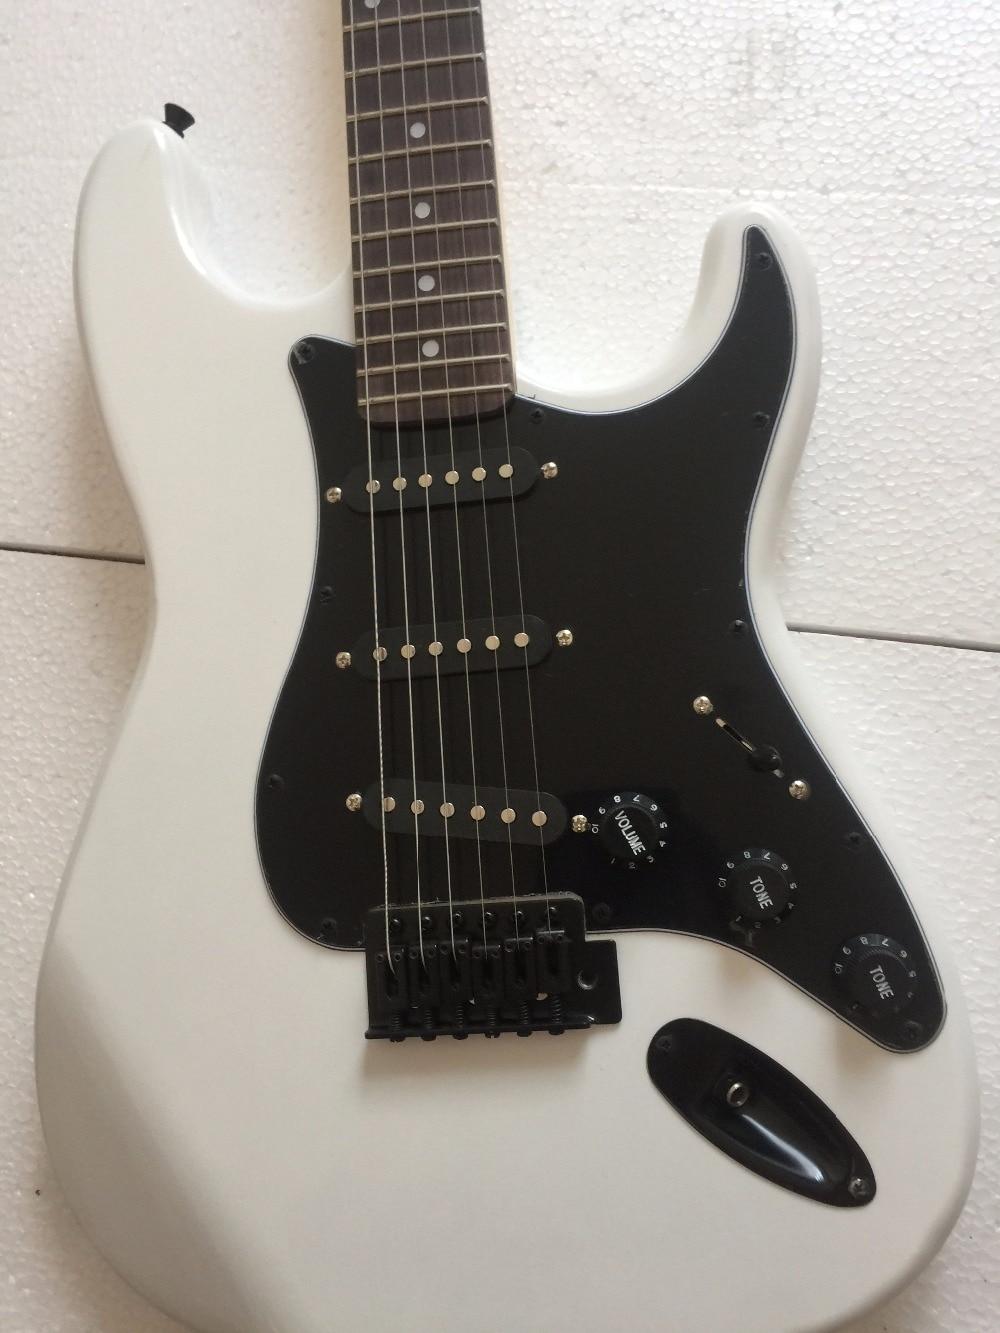 Anmiyue electric guitar / white blackboard electric guitar / customizable Guitar / guitar from ChinaAnmiyue electric guitar / white blackboard electric guitar / customizable Guitar / guitar from China